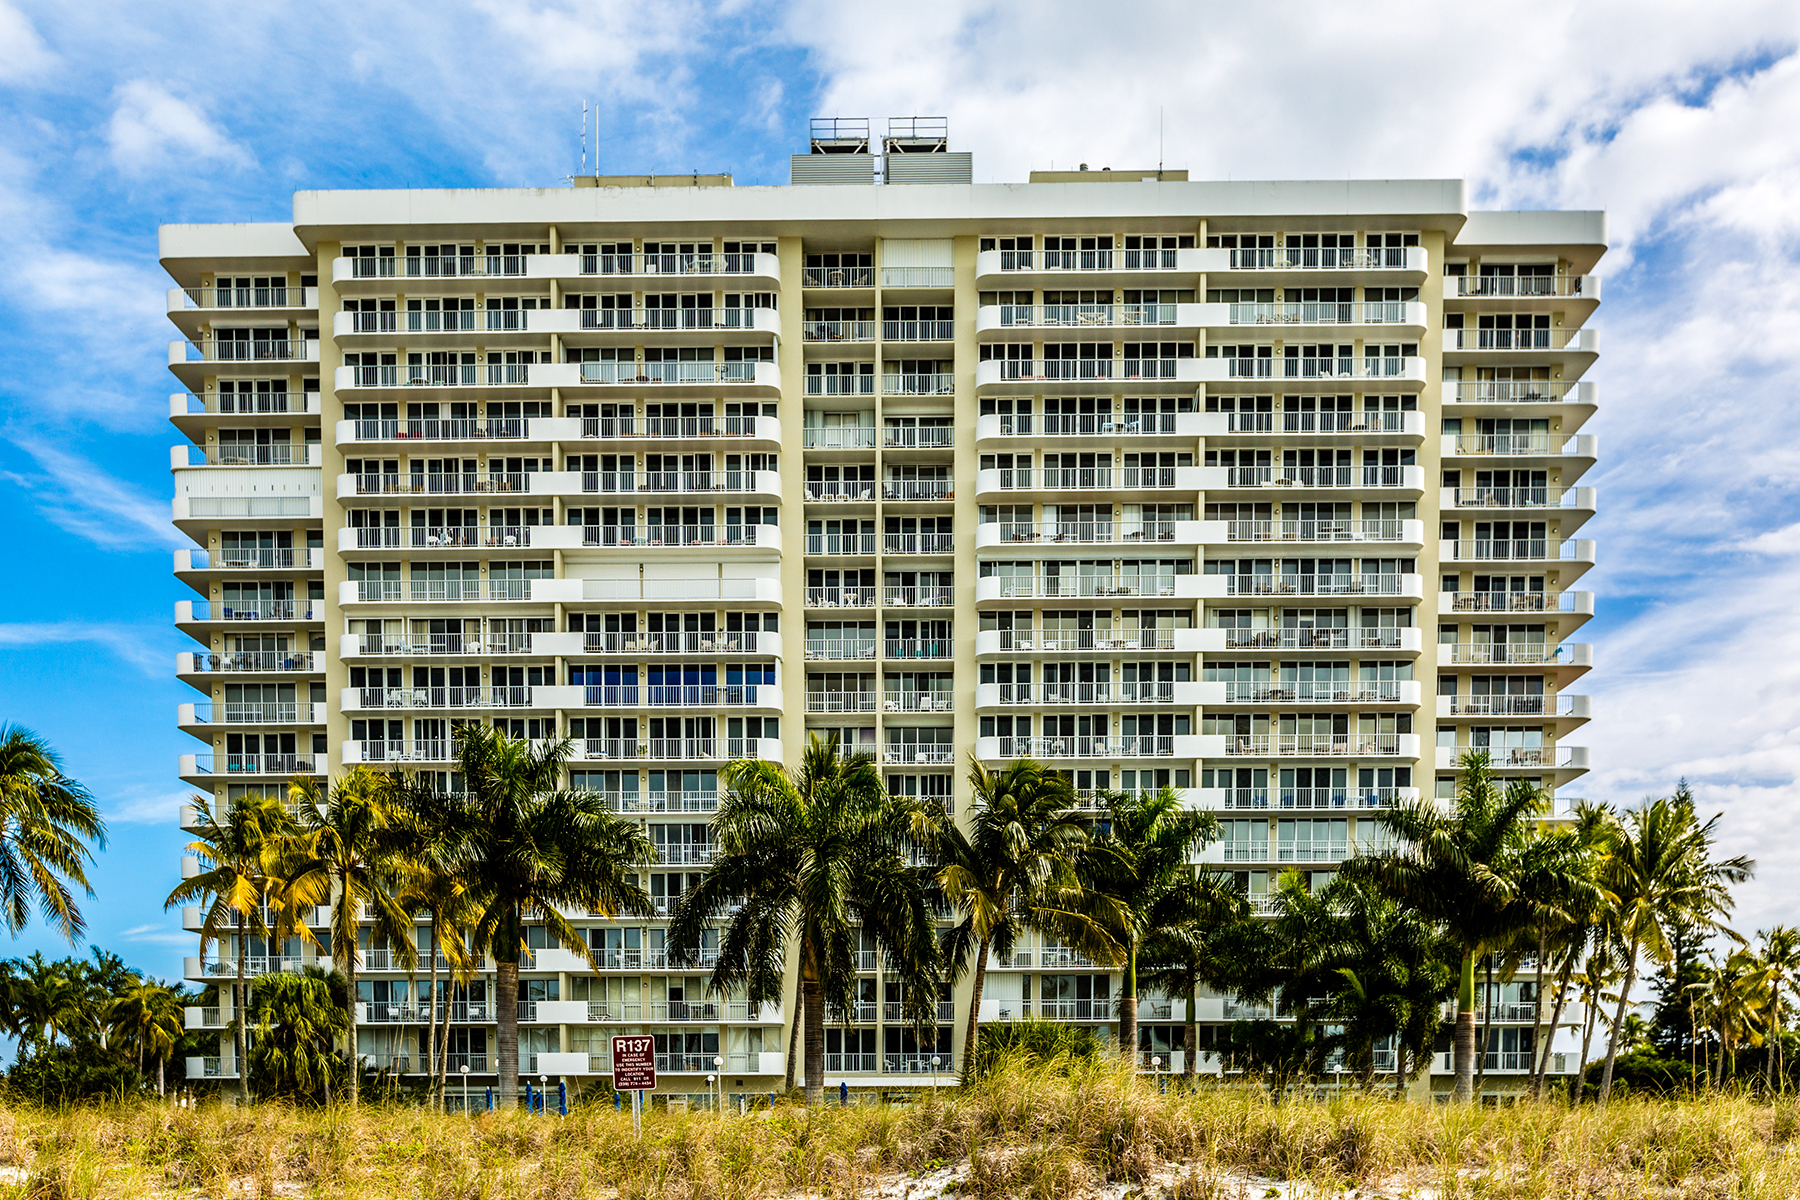 Кооперативная квартира для того Продажа на ADMIRALTY HOUSE - ADMIRALTY HOUSE 140 Seaview Ct 1604 N Marco Island, Флорида, 34145 Соединенные Штаты